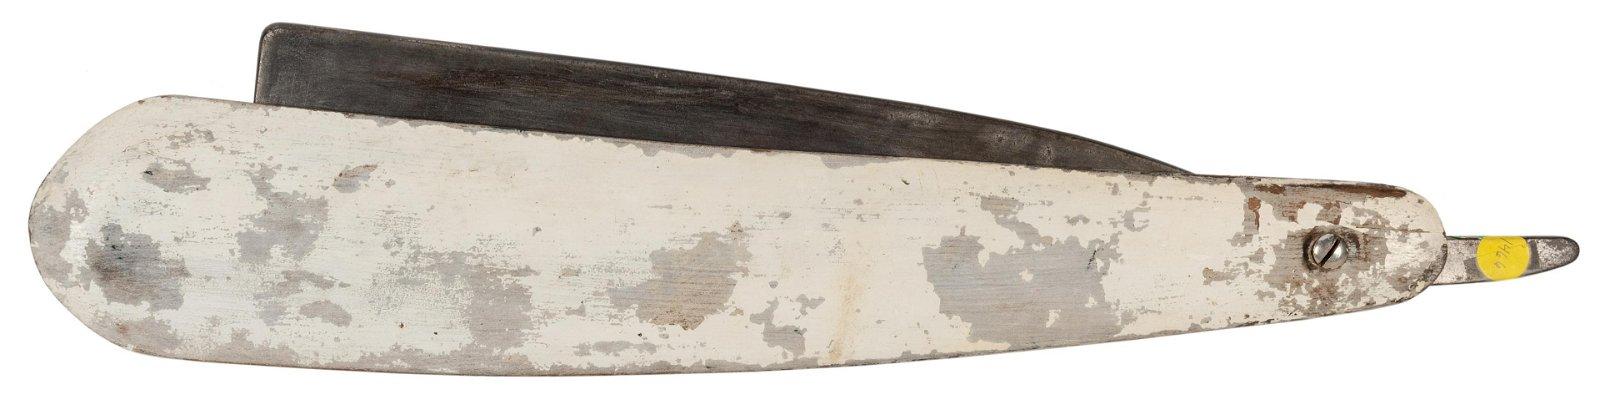 Wooden and Zinc Straight Razor Trade Figure.